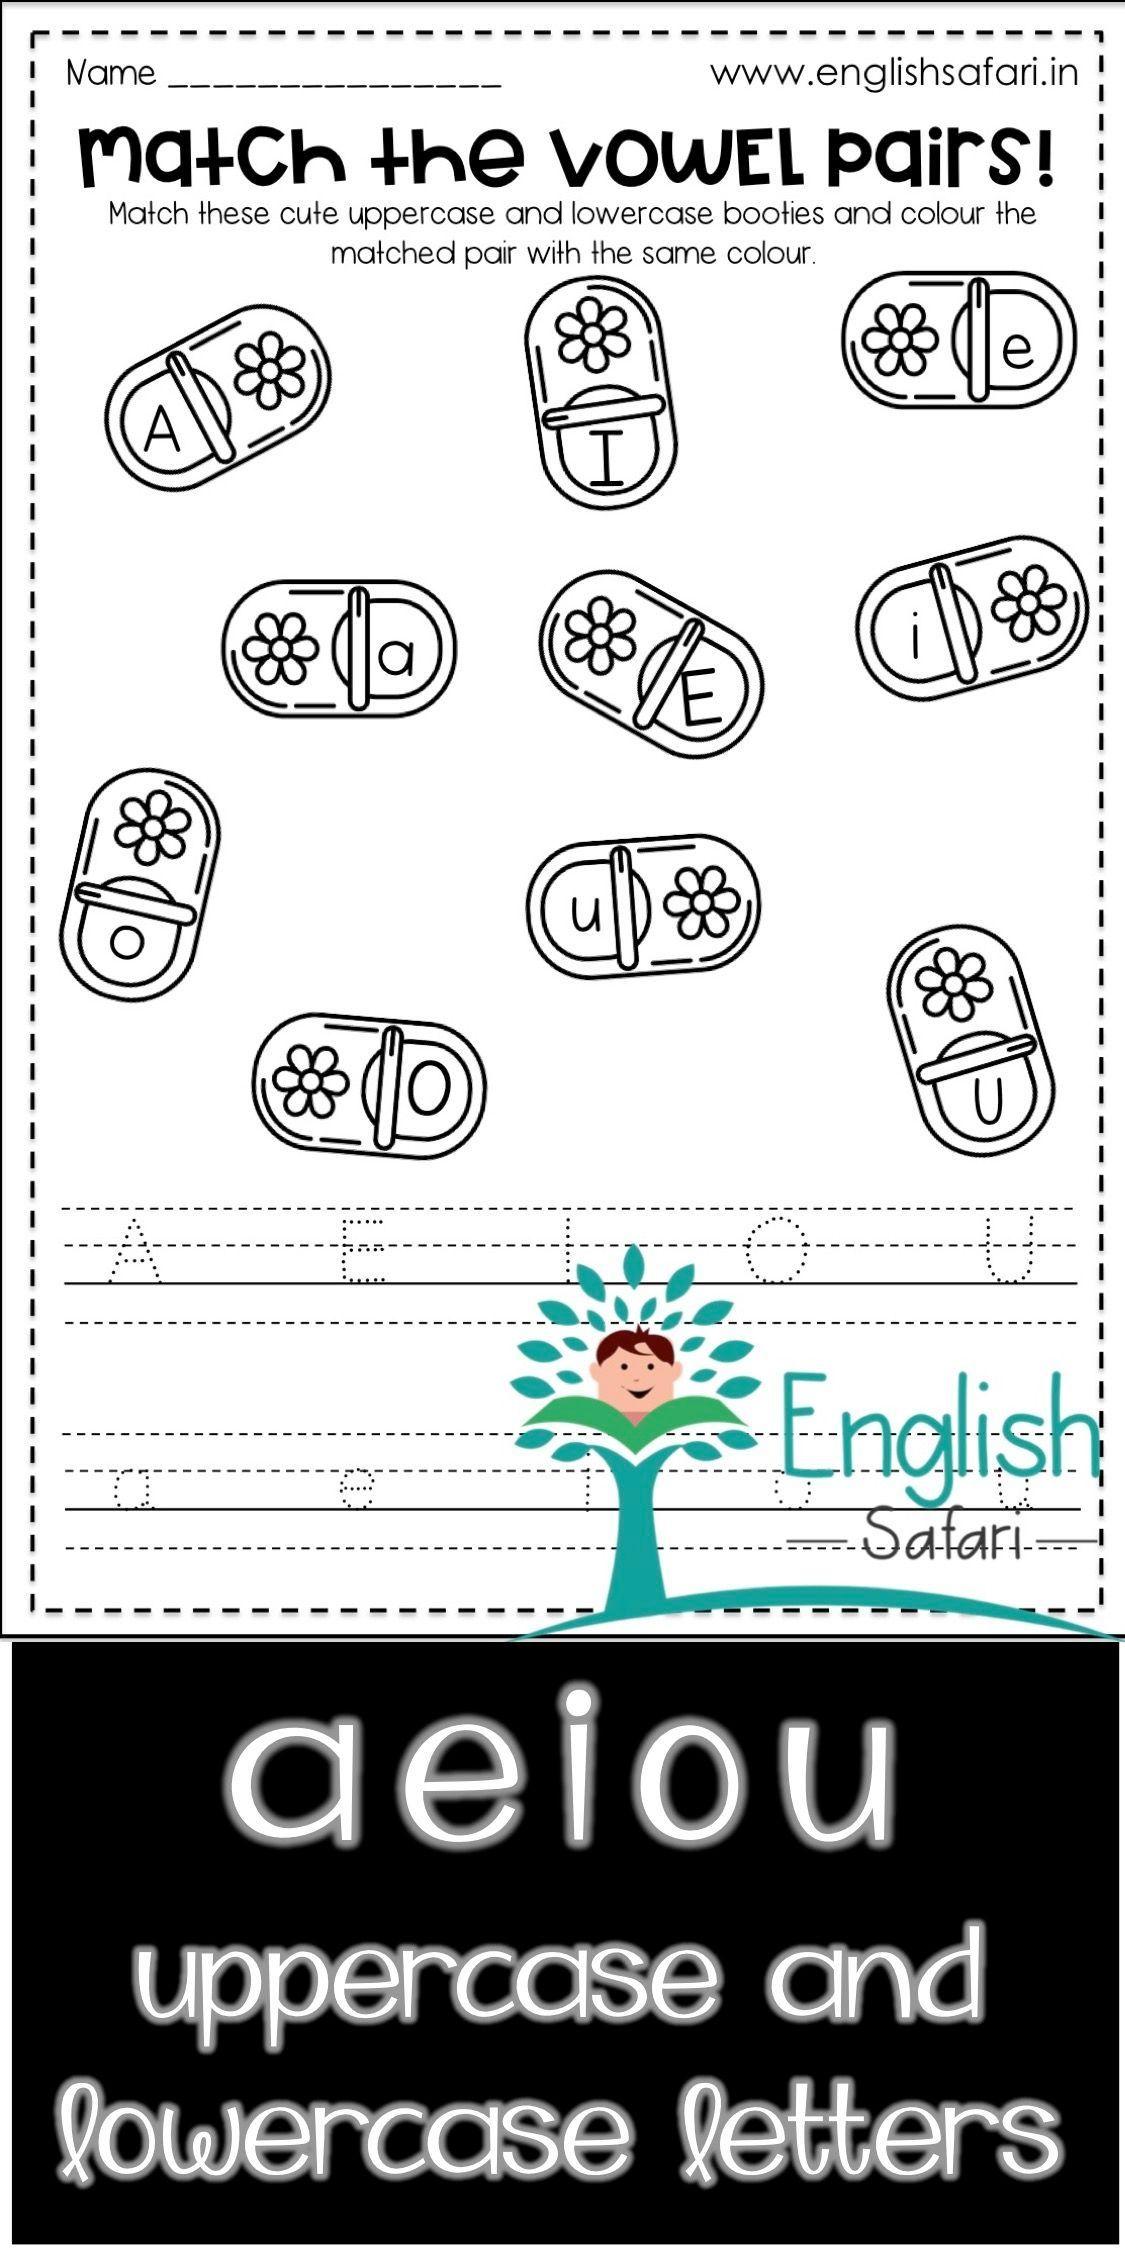 A E I O U Letter Worksheet Free Www Worksheetsenglish Com In 2021 Letter Worksheets For Preschool Preschool Letters Letter Worksheets [ 2249 x 1125 Pixel ]